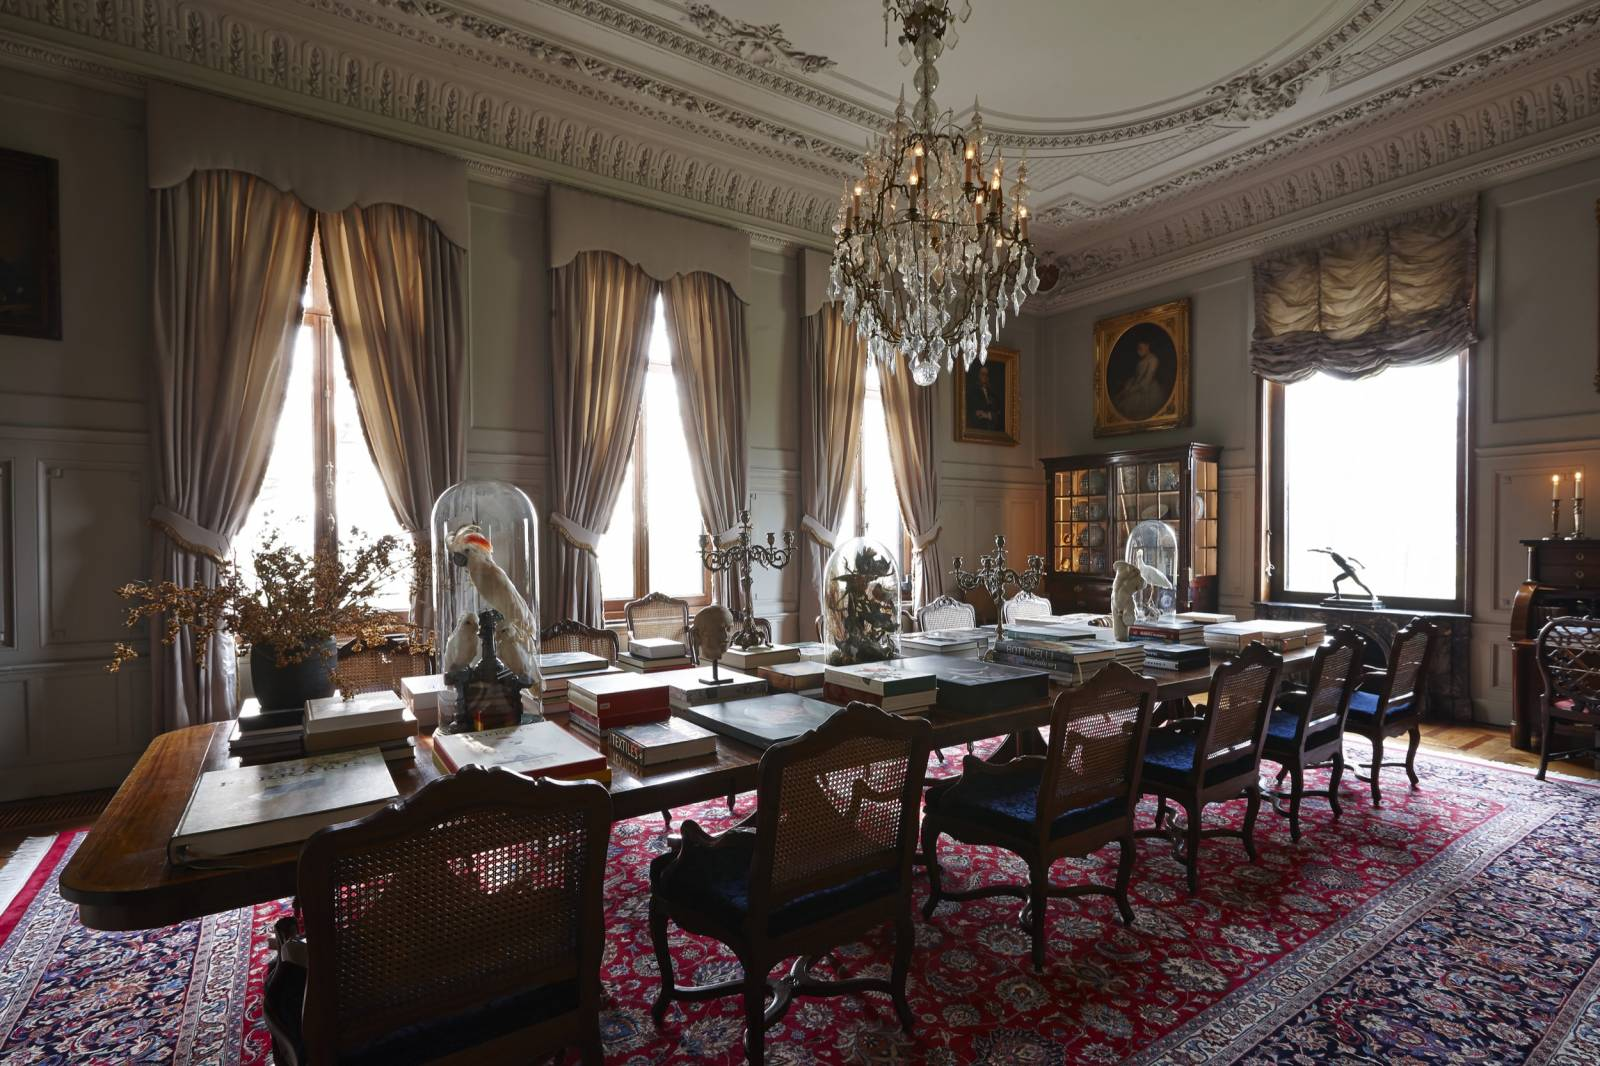 Chateau de Spycker - House of Weddings-12